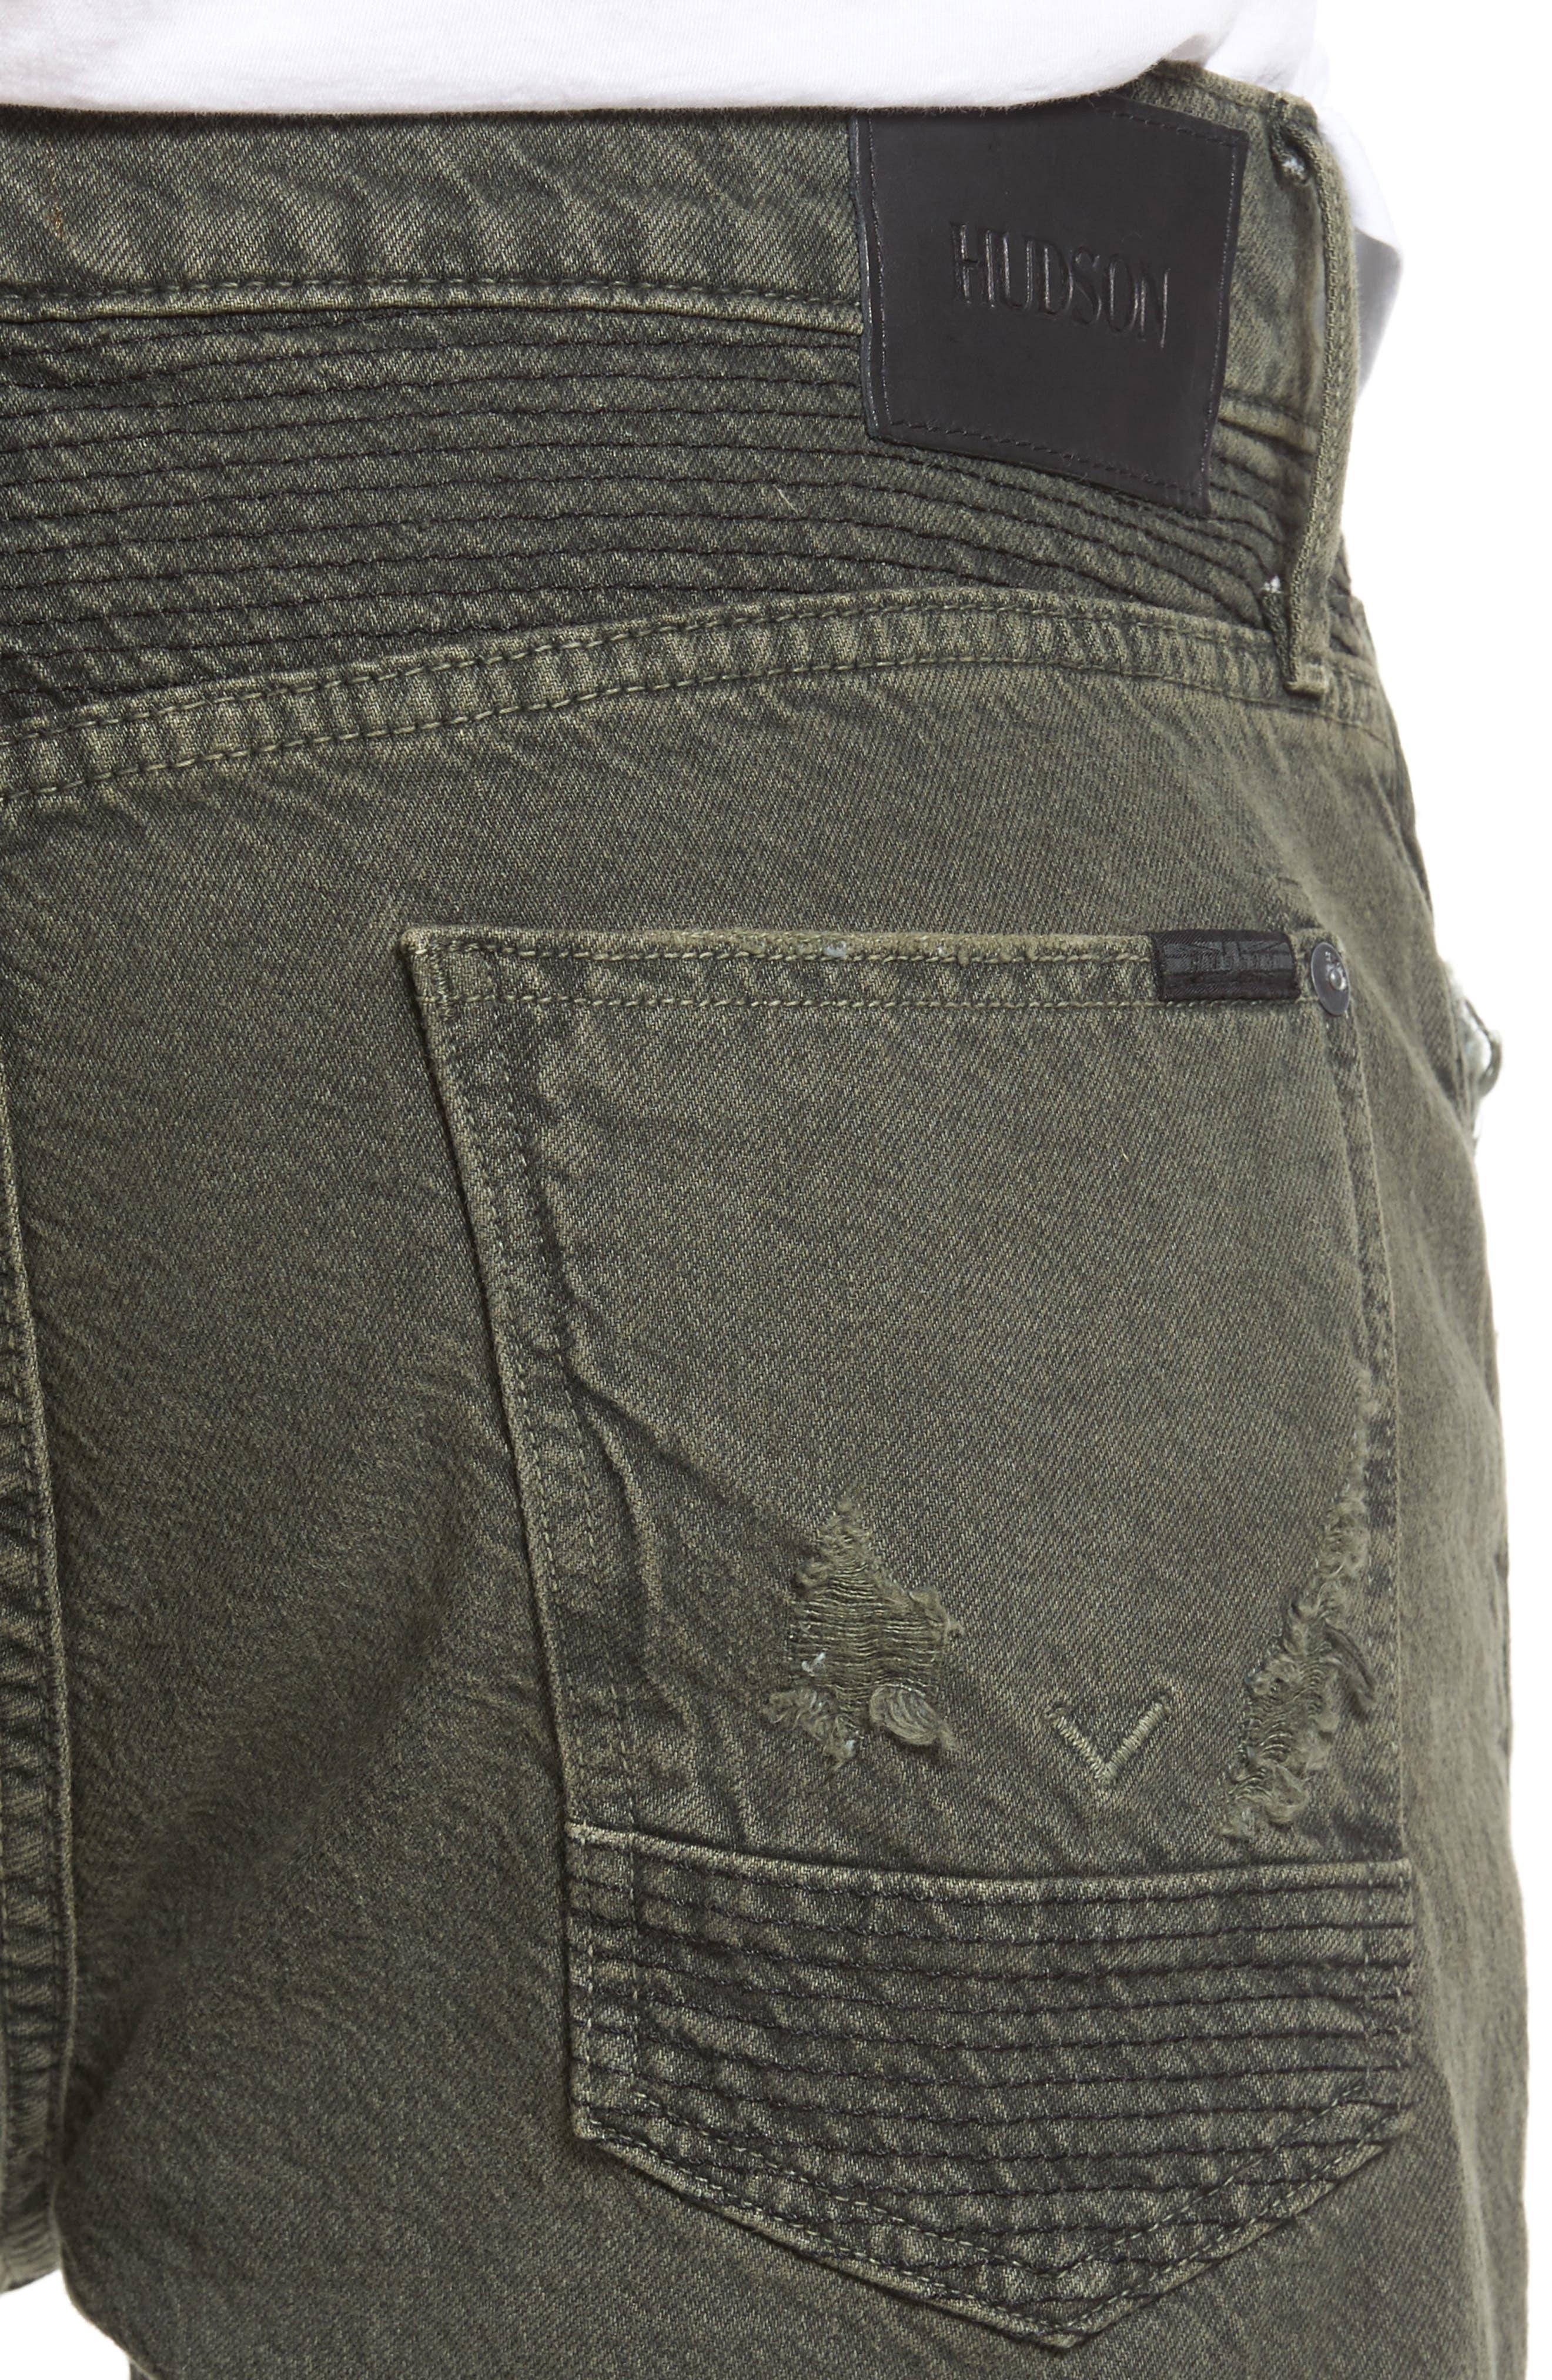 Blinder Biker Skinny Fit Jeans,                             Alternate thumbnail 4, color,                             Fortitude Green